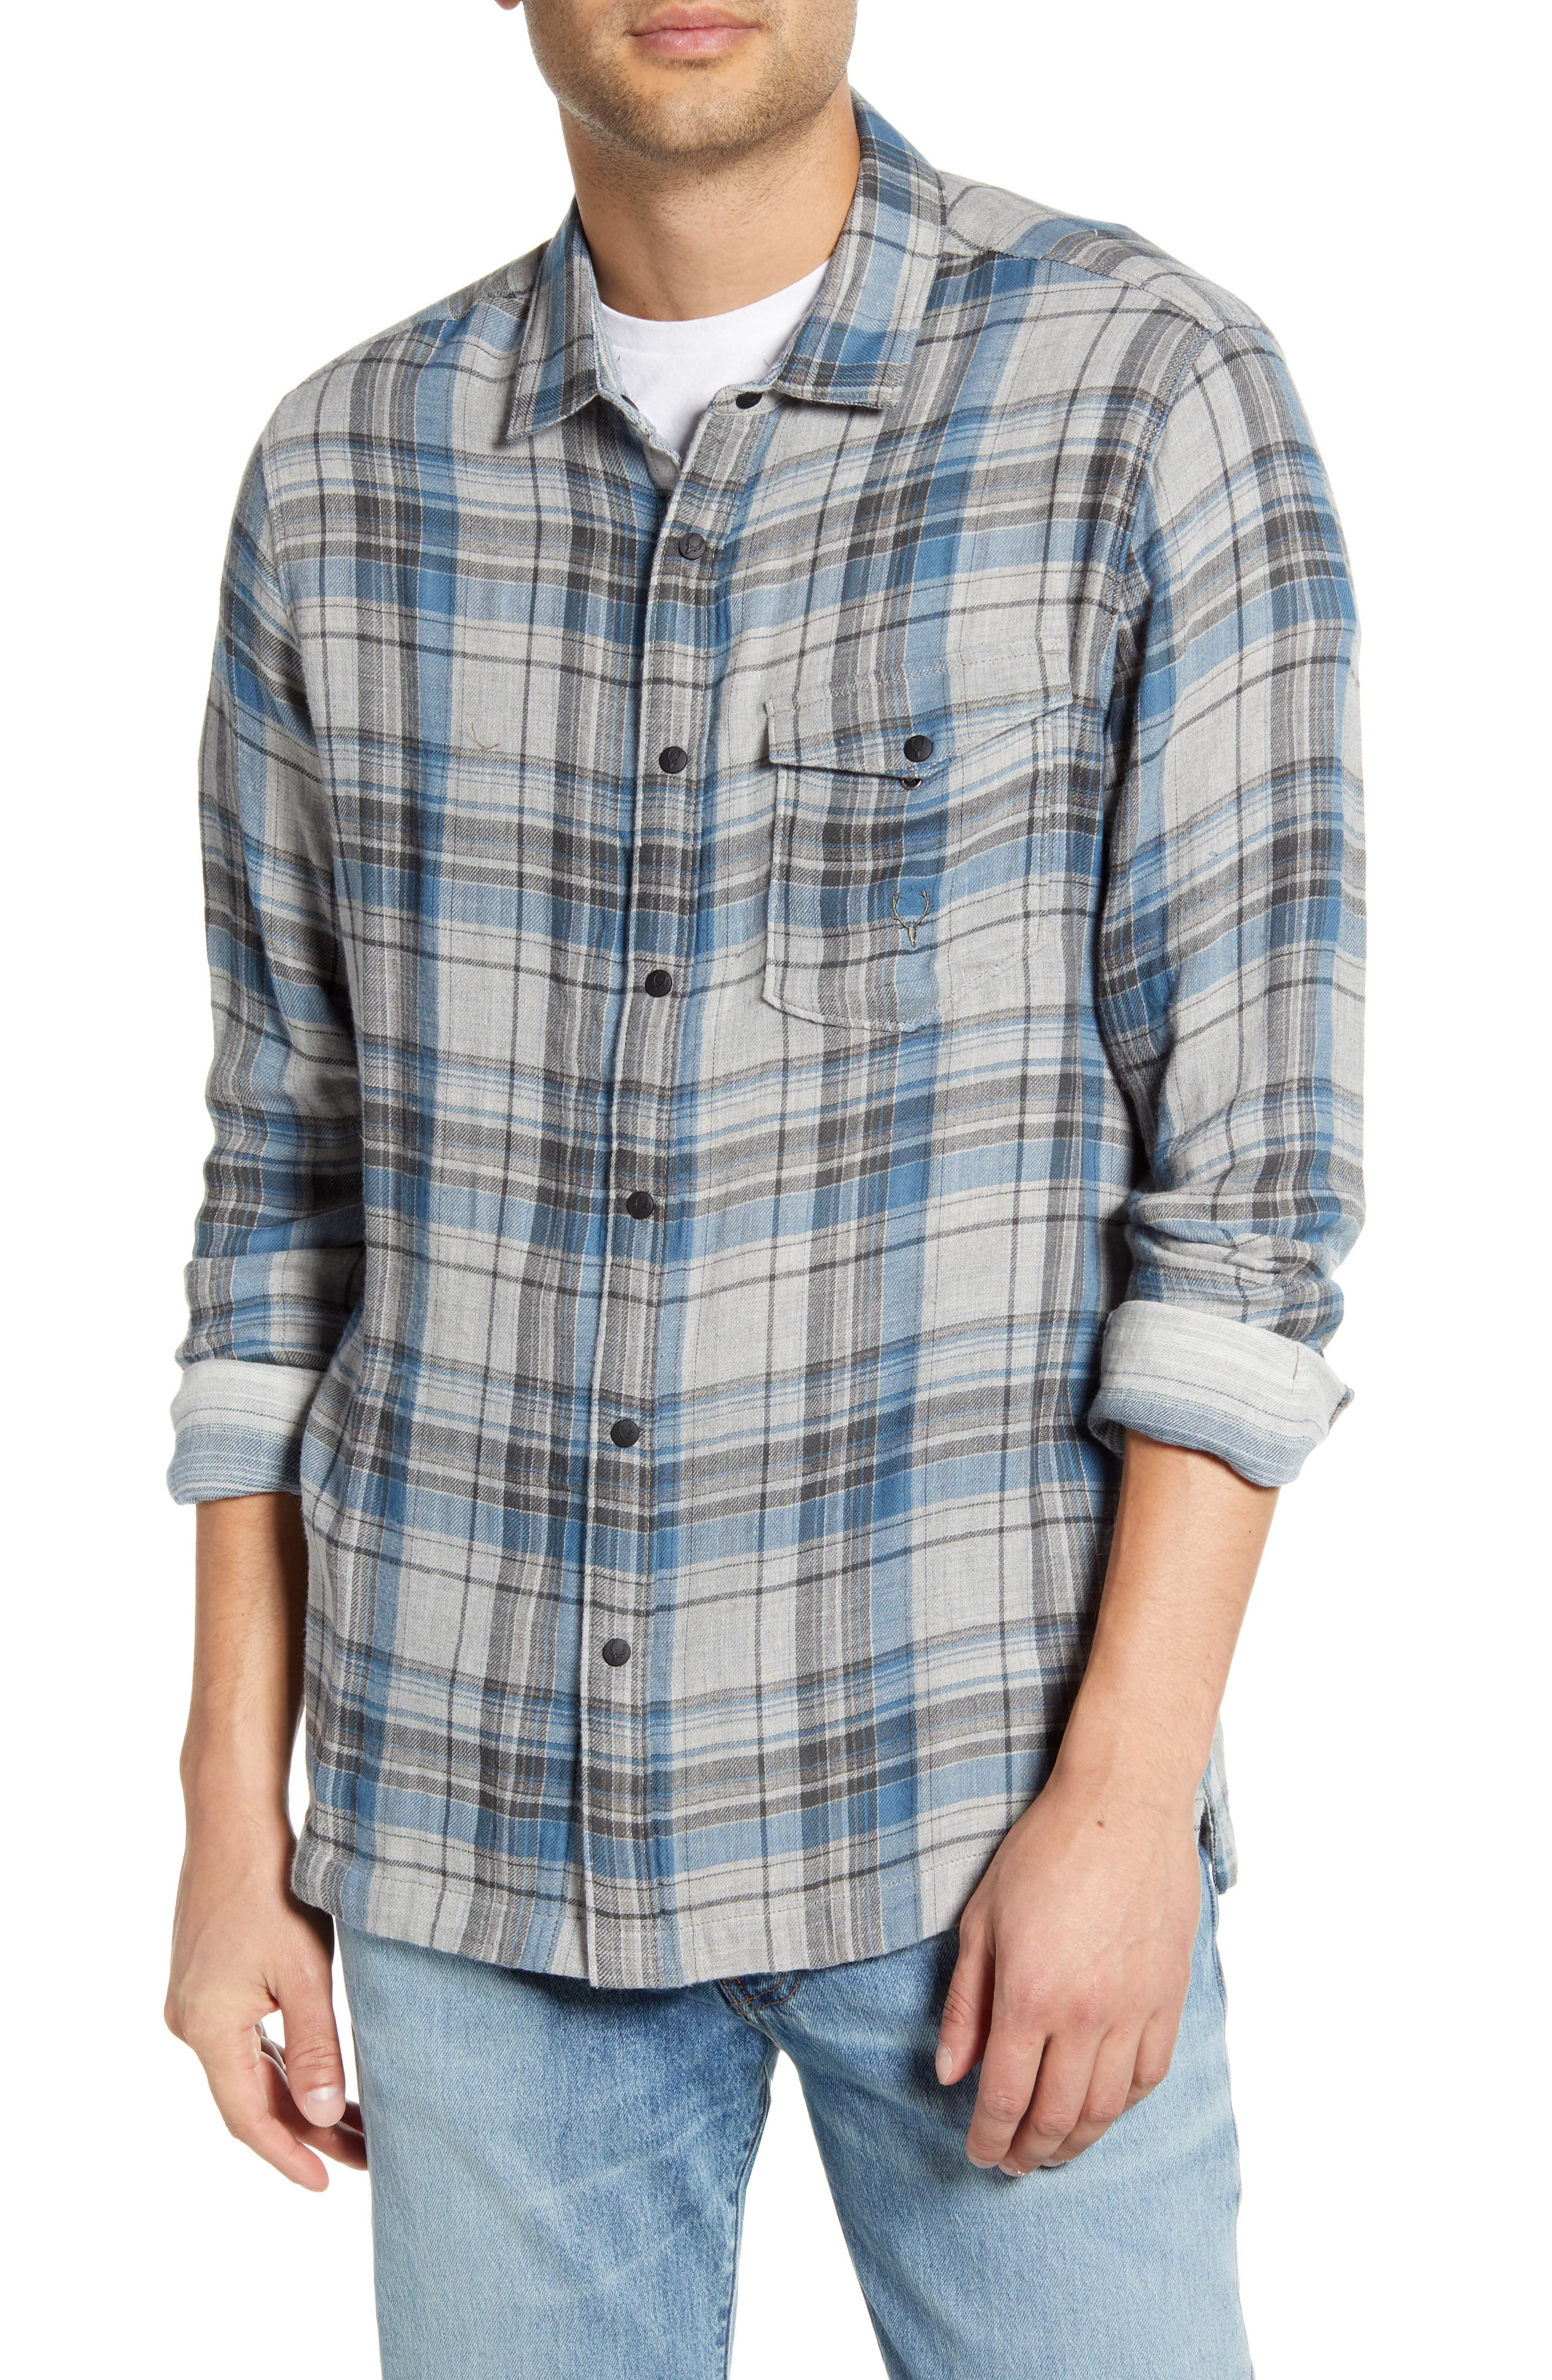 Stag Reversible Plaid & Stripe Cotton Blend Shirt